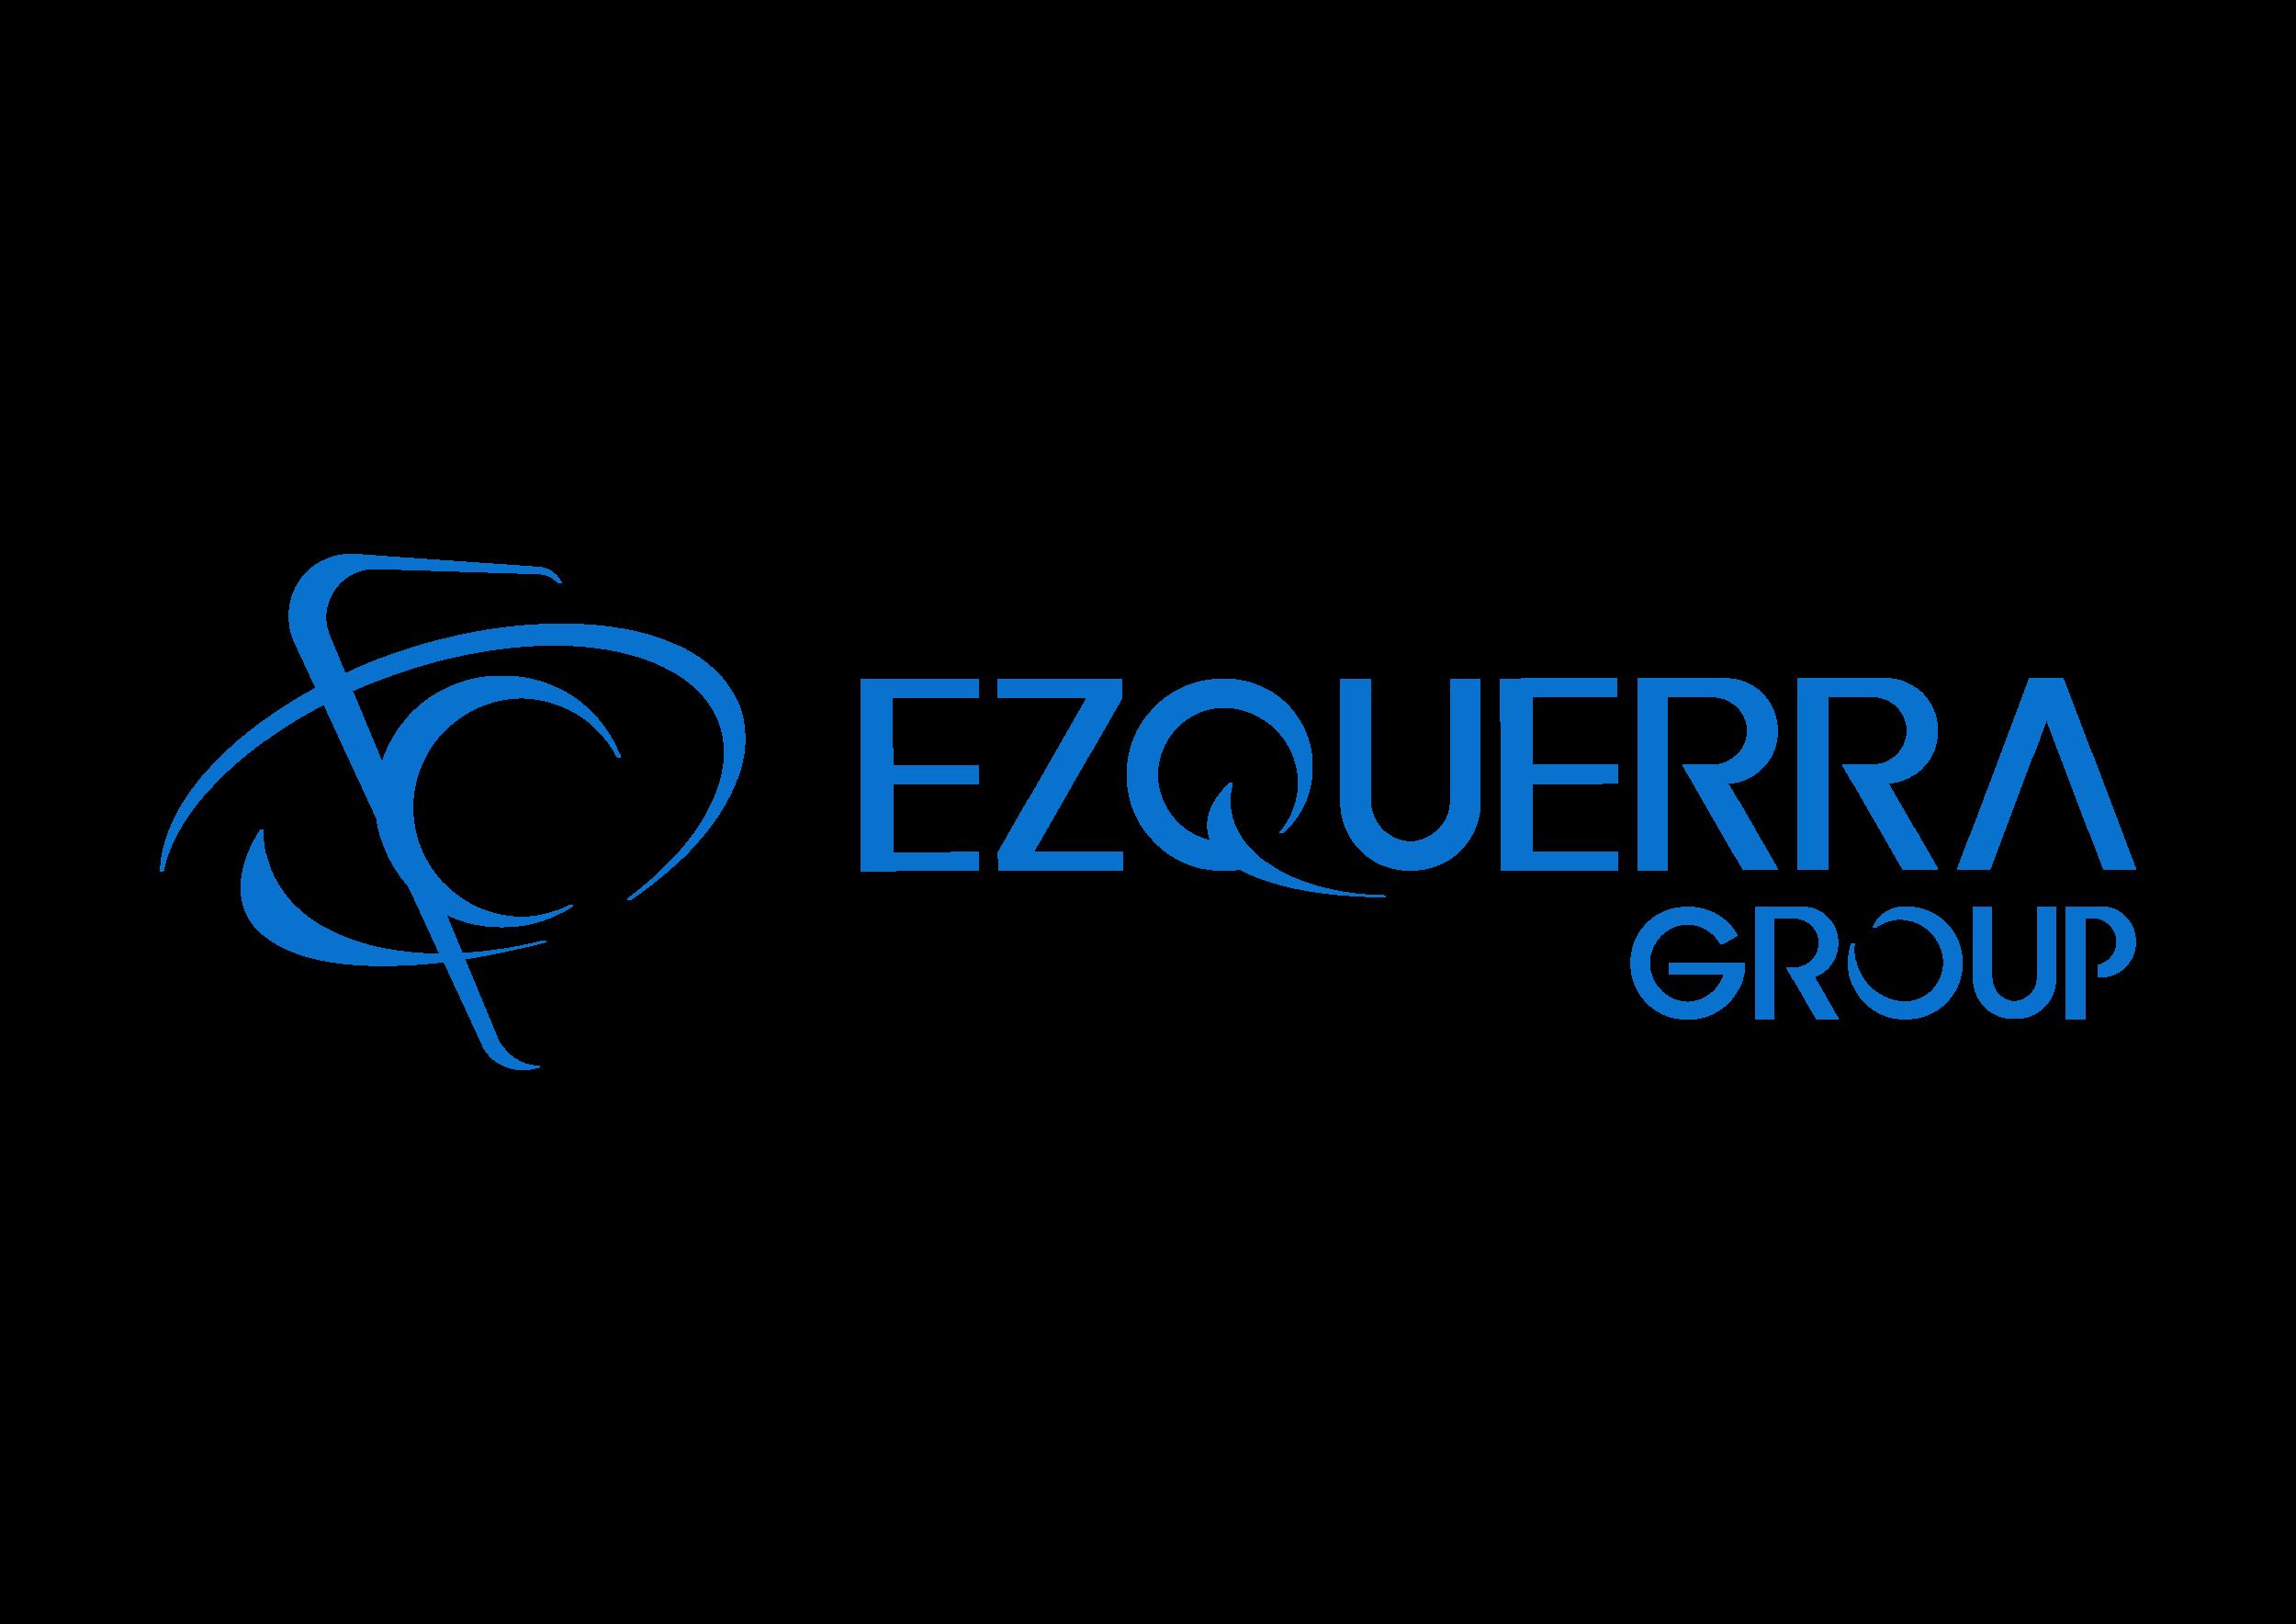 LOGO EZQUERRA GROUP.png